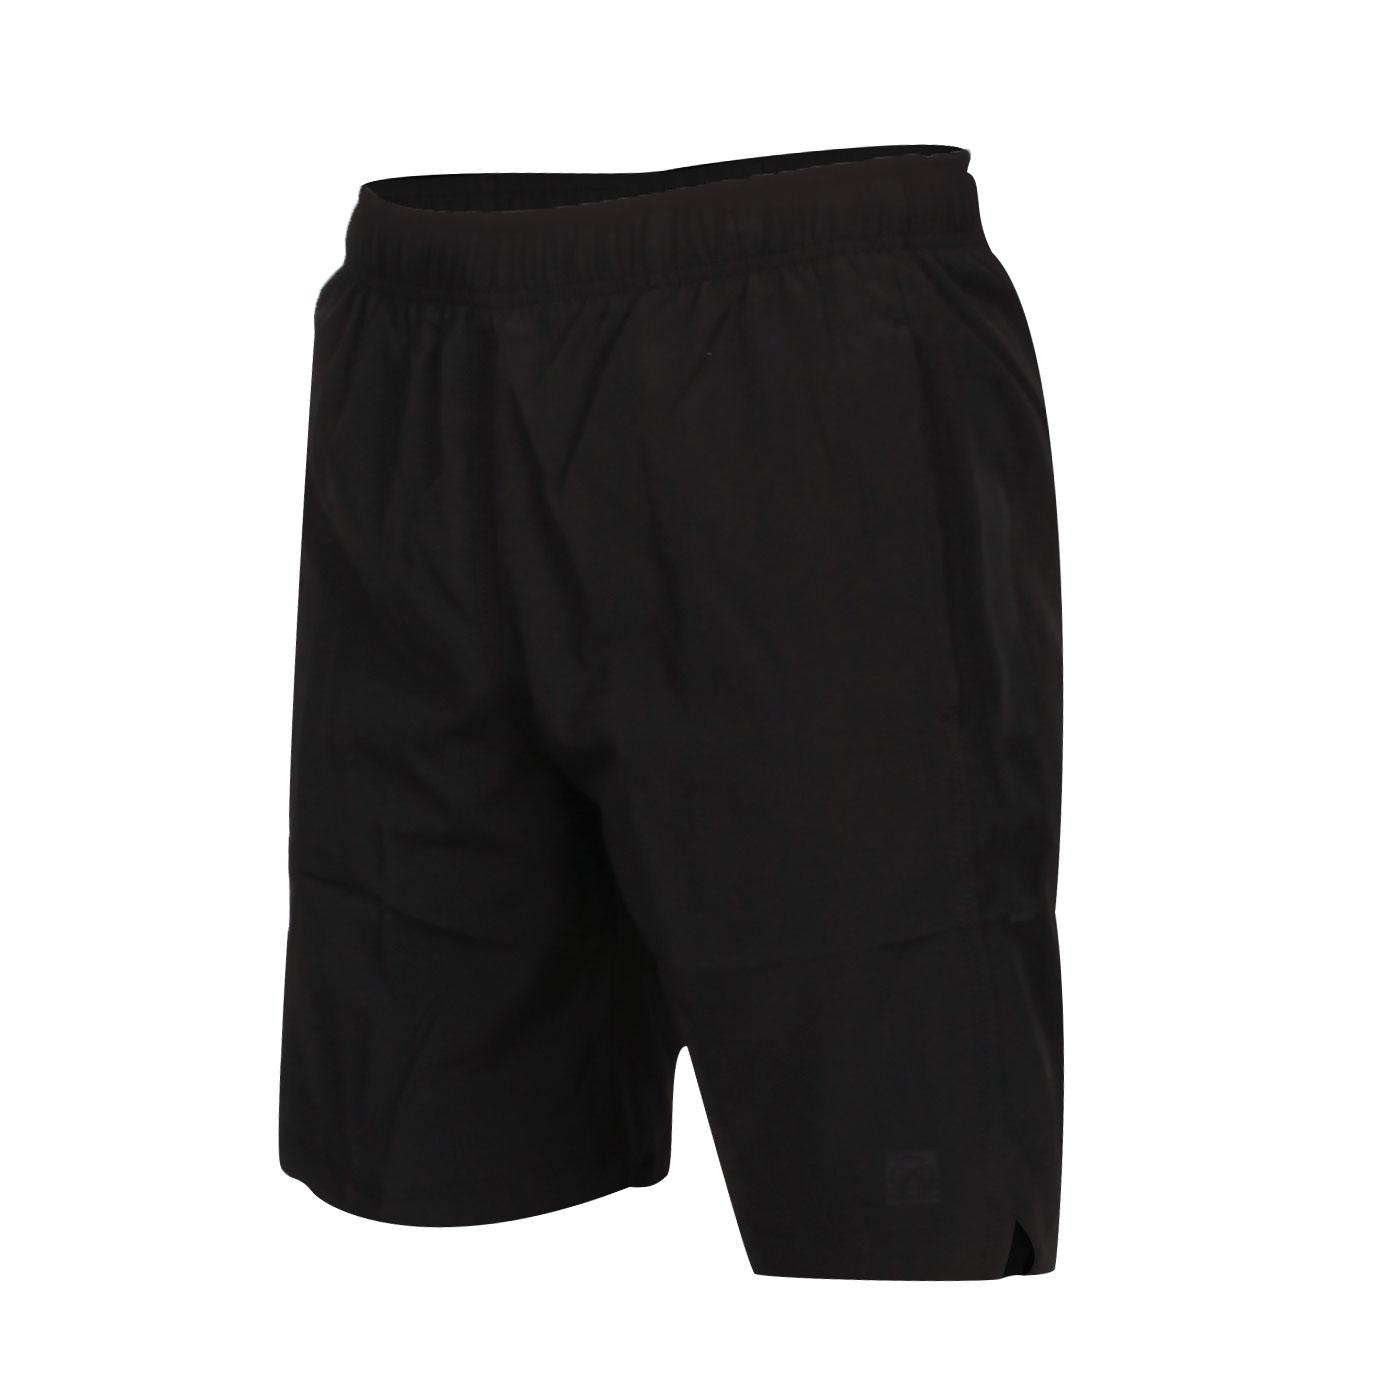 FIRESTAR 男款彈性平織短褲 C0515-10 - 黑